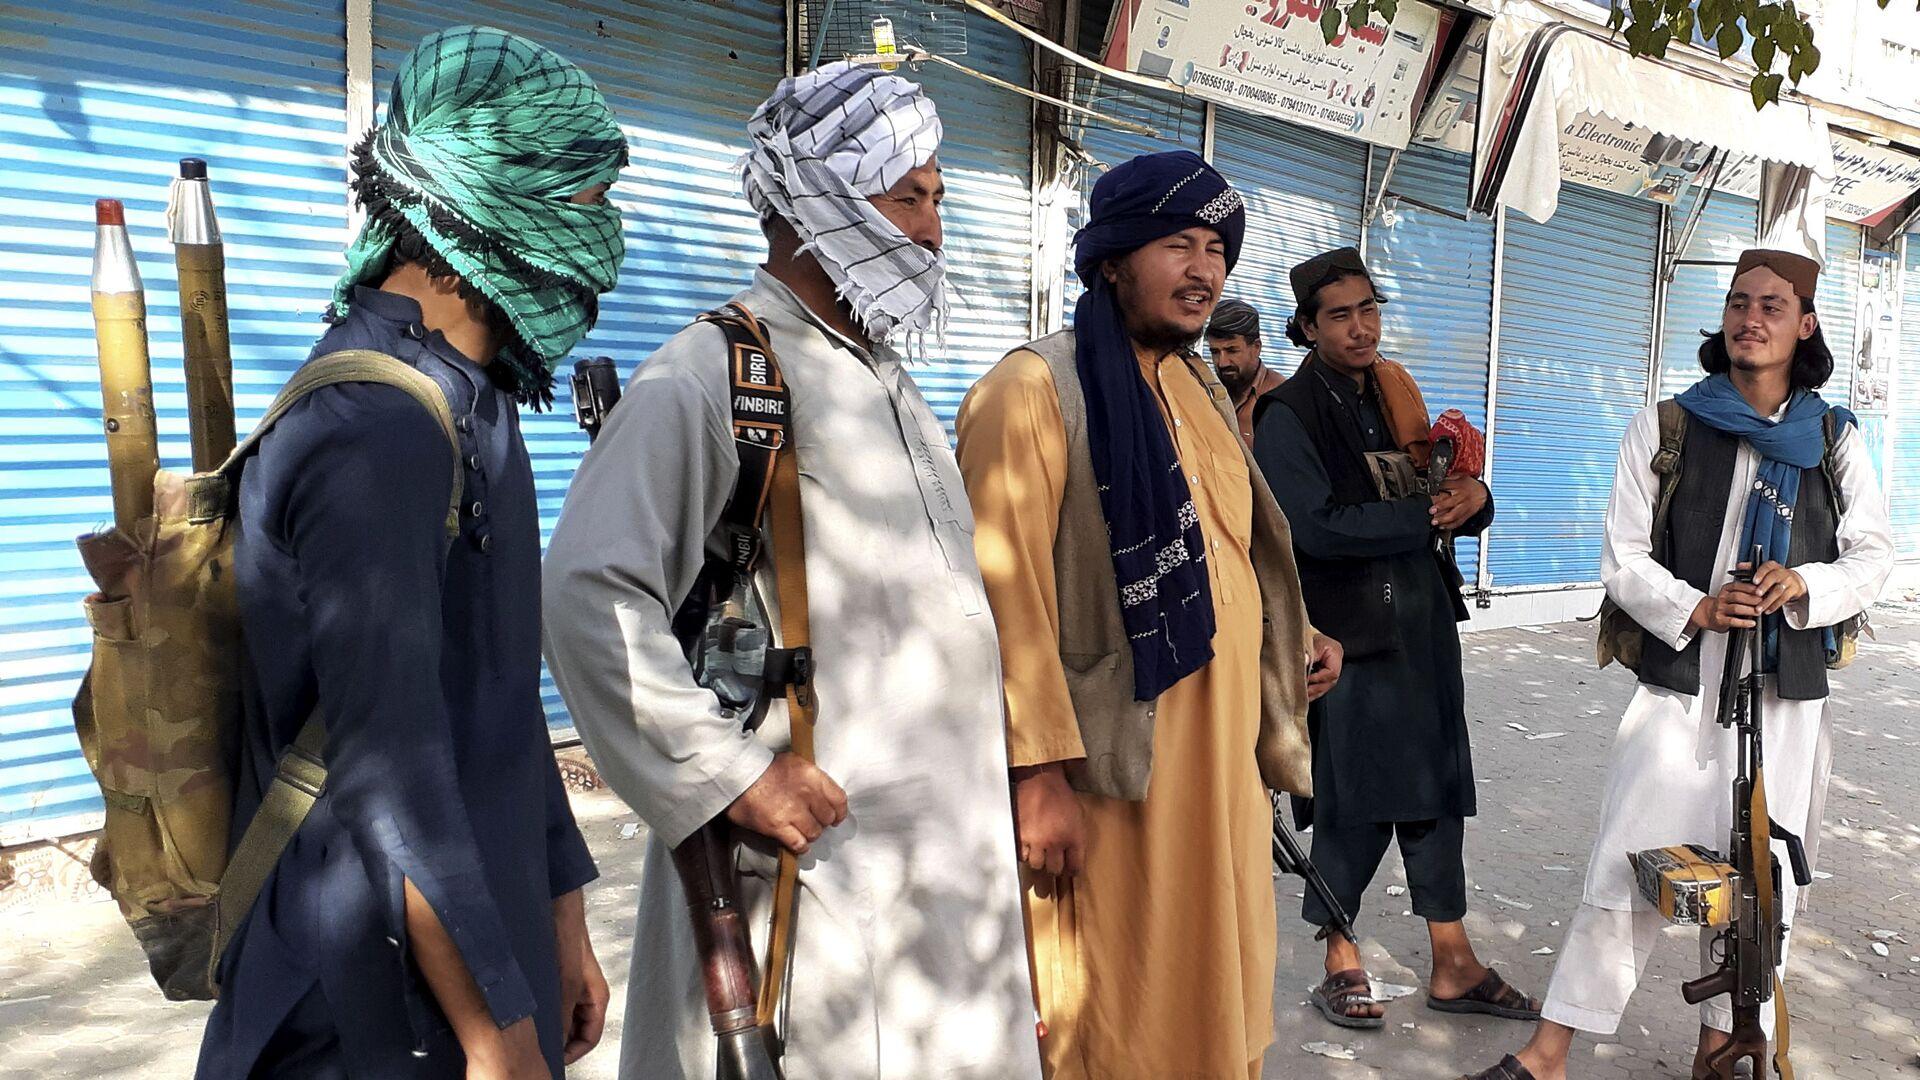 Боевики Талибана* в городе Кундуз, Афганистан - Sputnik Узбекистан, 1920, 28.09.2021